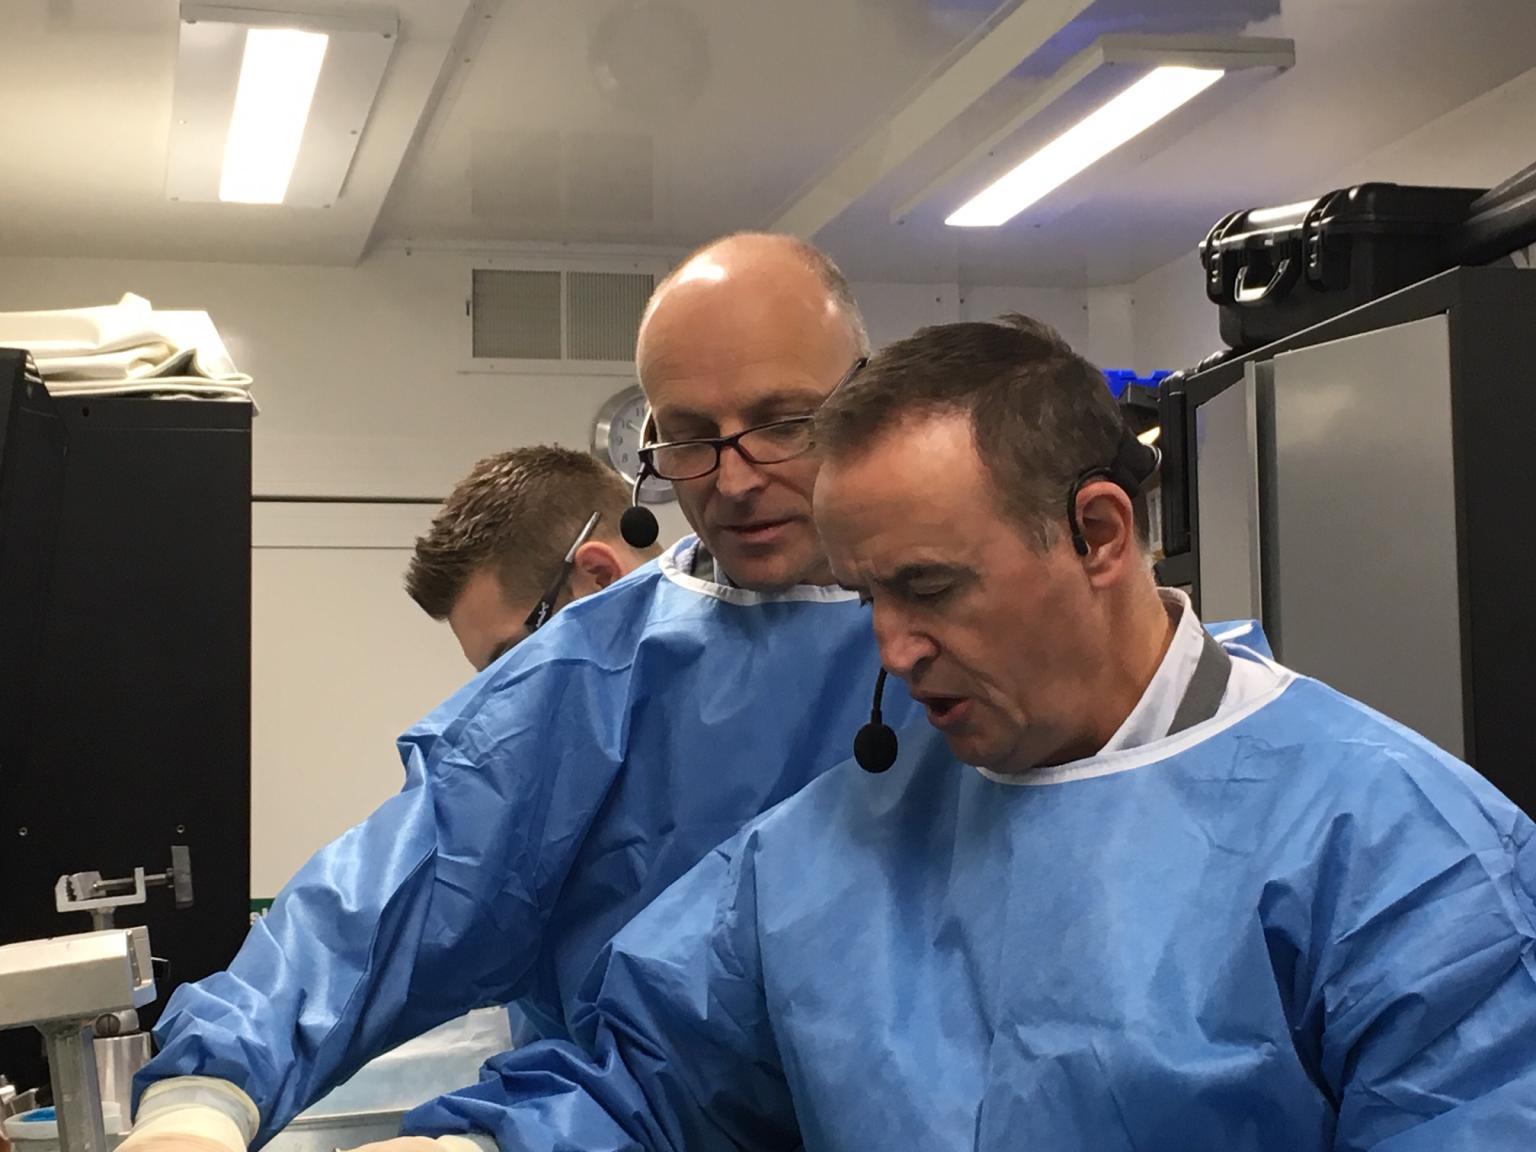 Surgeons in wet lab